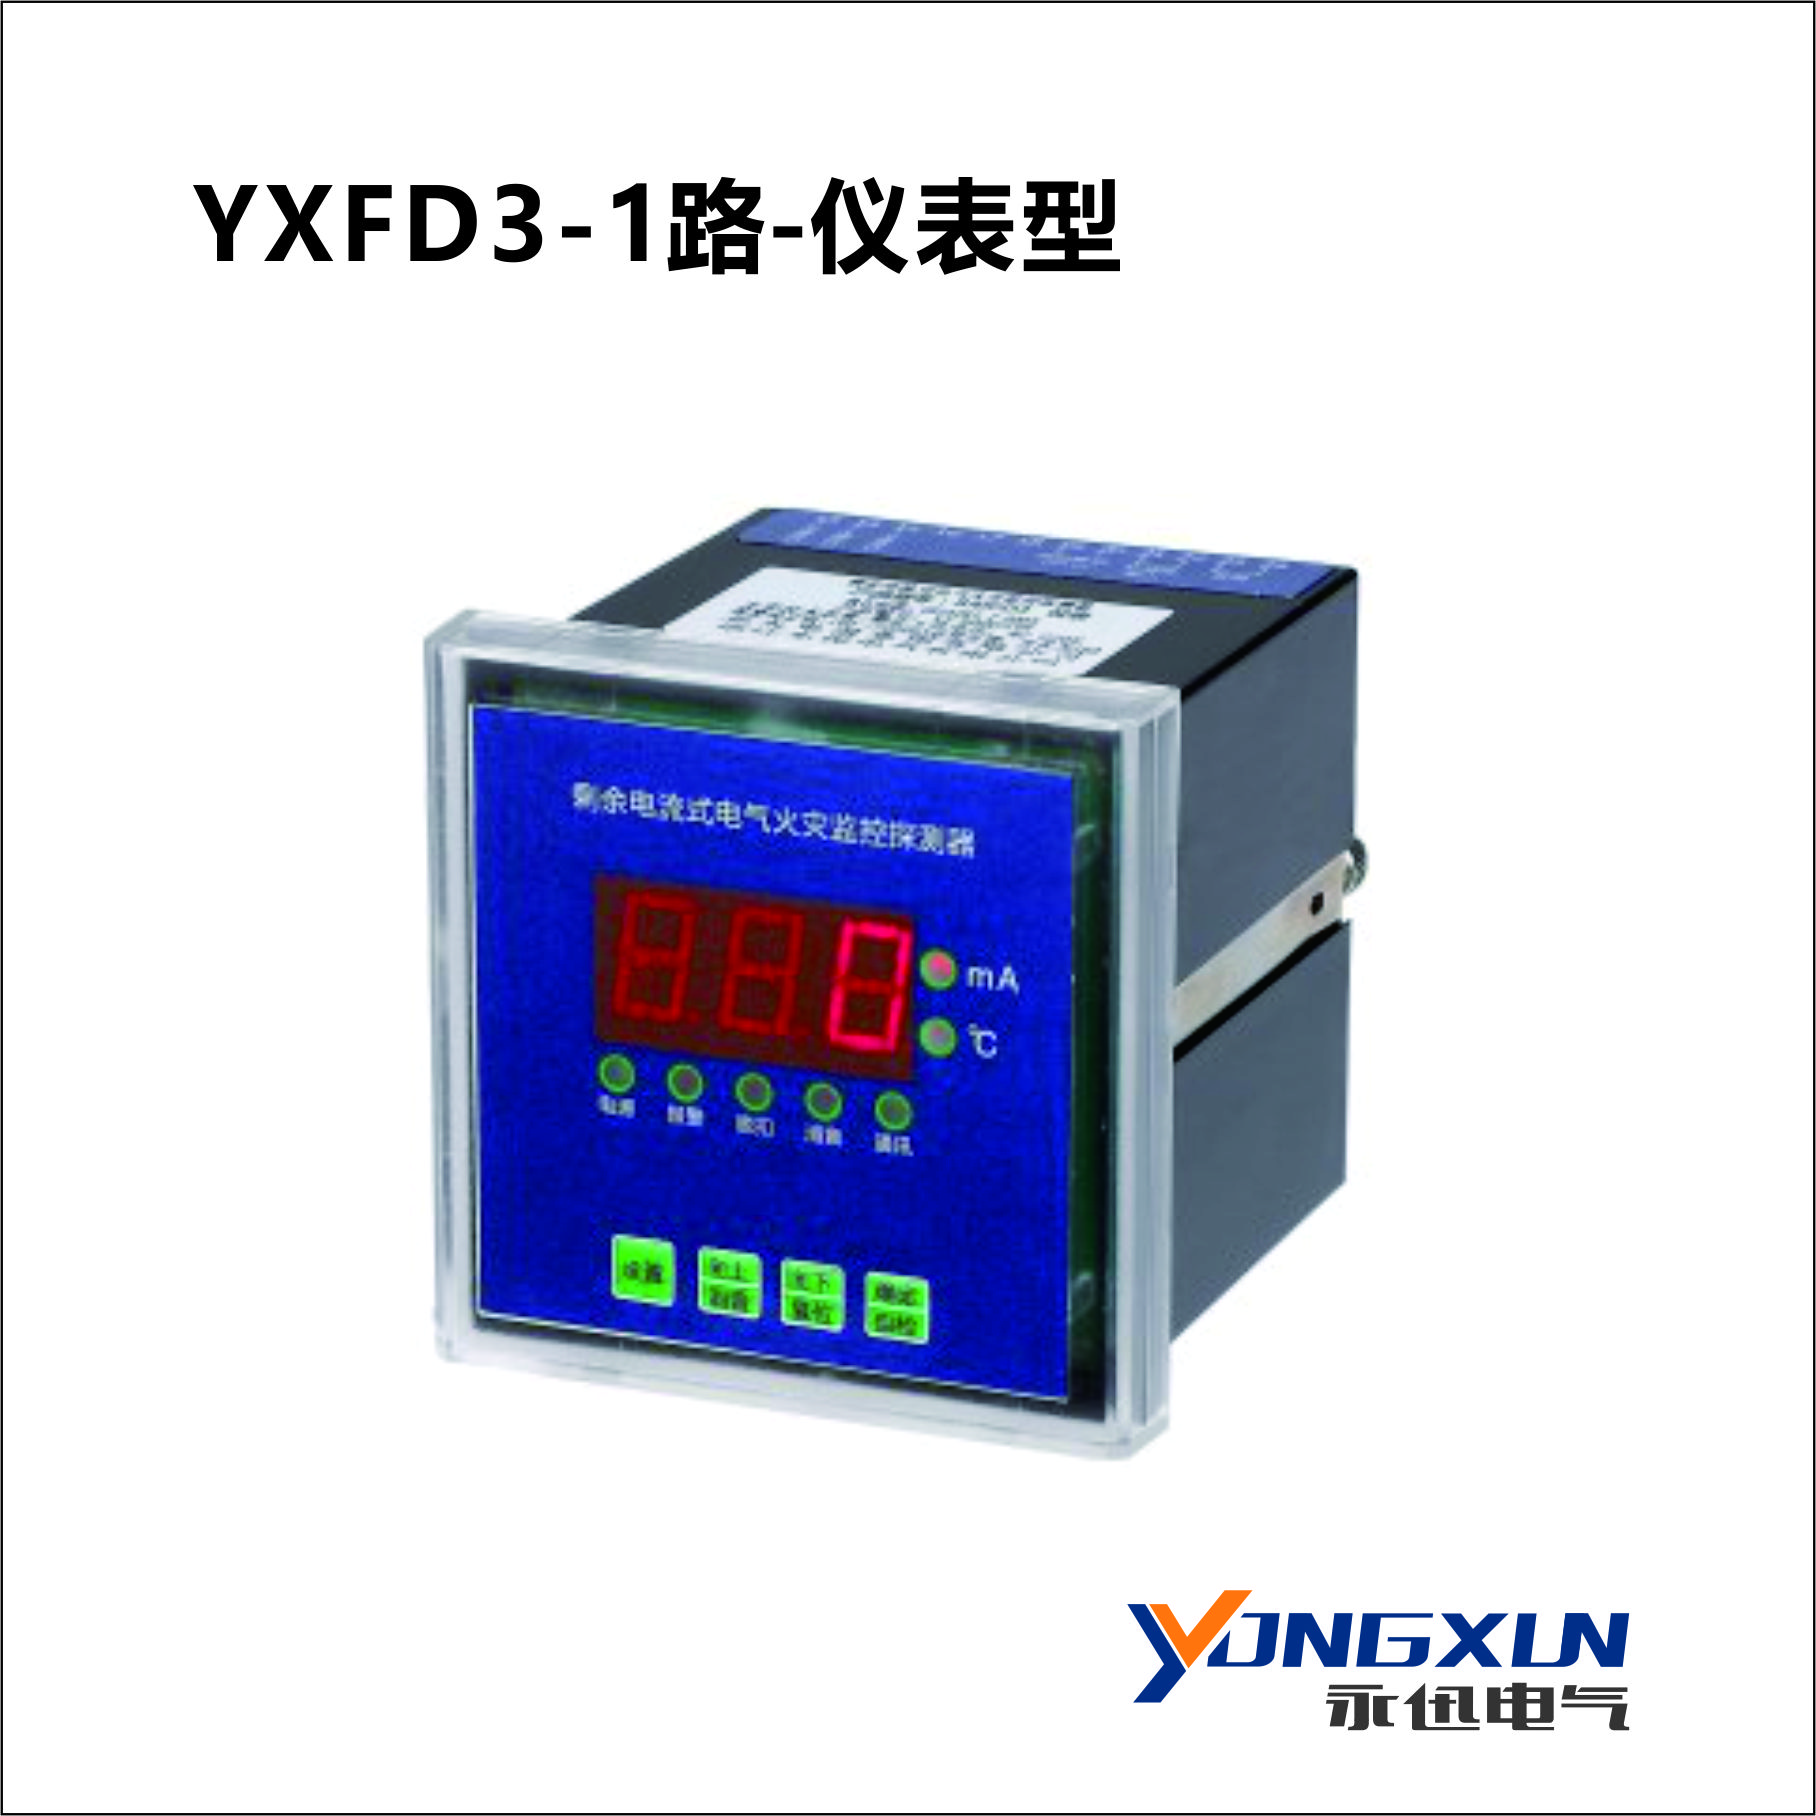 YXFD3-1路数码管仪表型火灾监控探测器